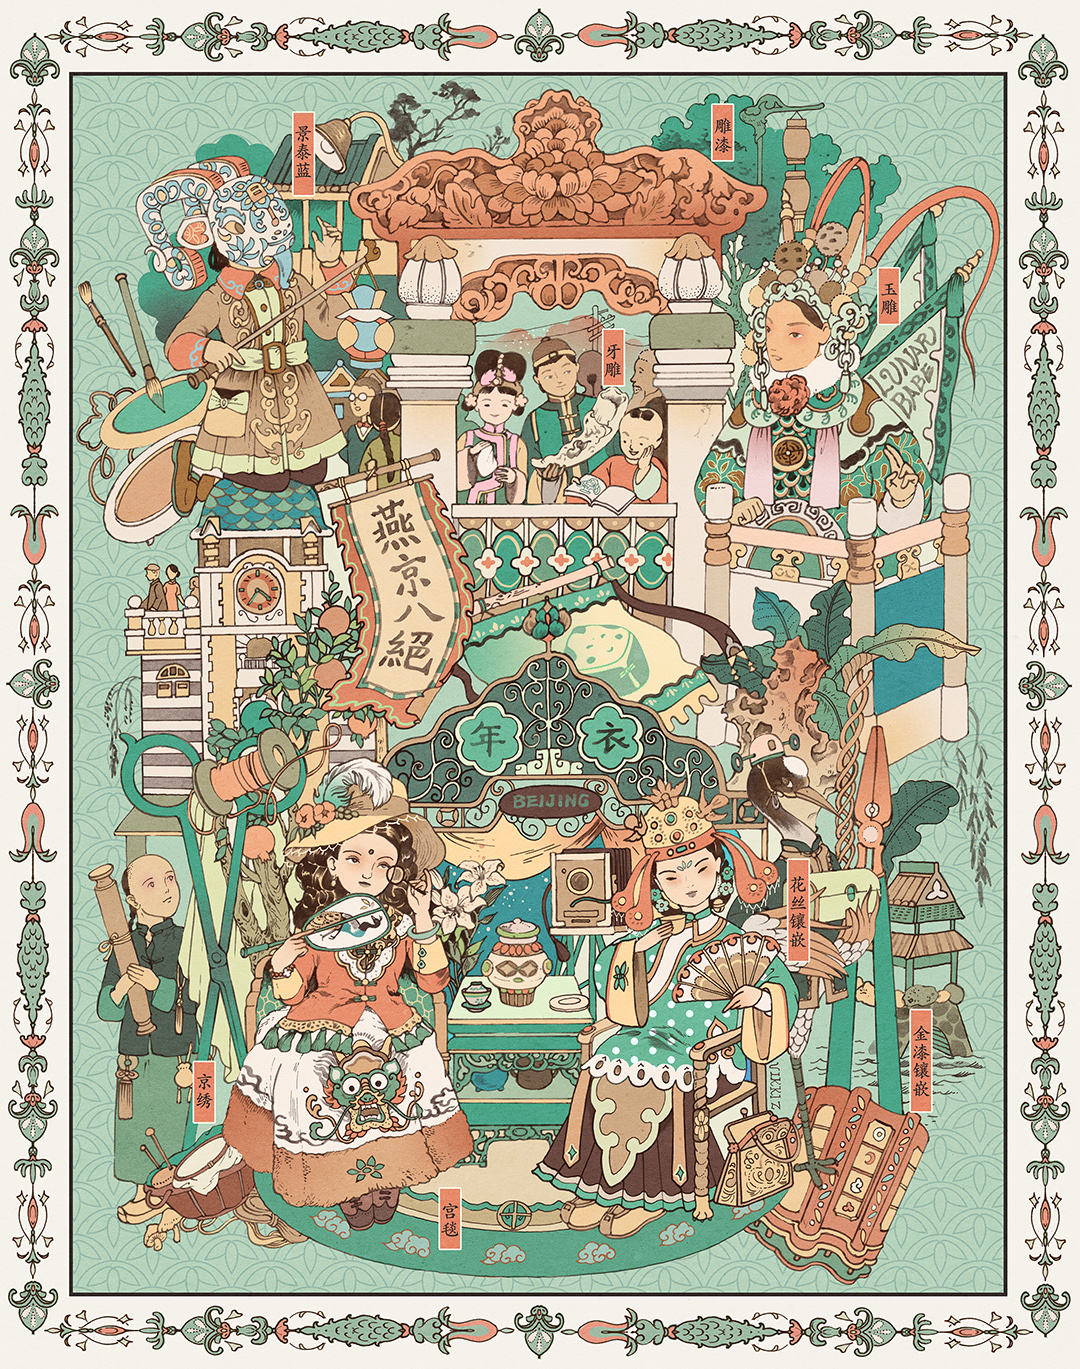 GirlsclubAsia-Illustrator-Vikki Zhang-NIANYI_aw20_KV